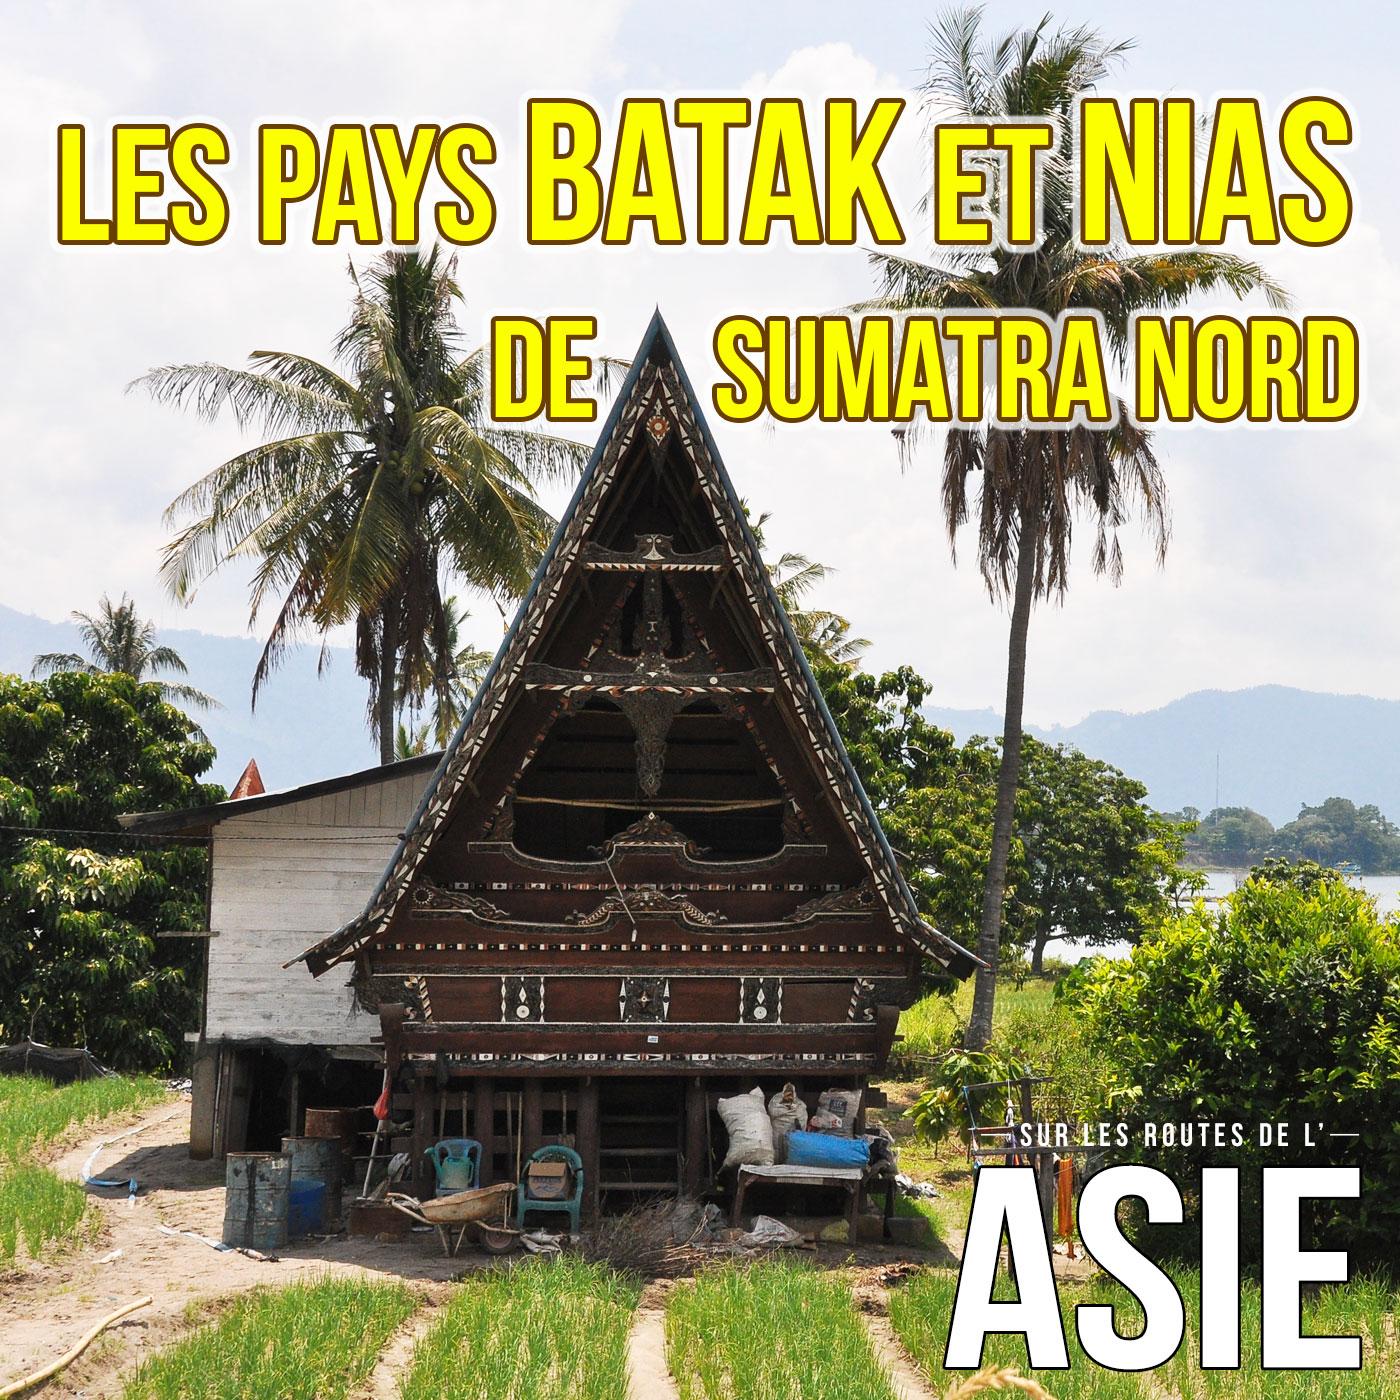 Les pays Batak et Nias de Sumatra Nord (Indonésie)